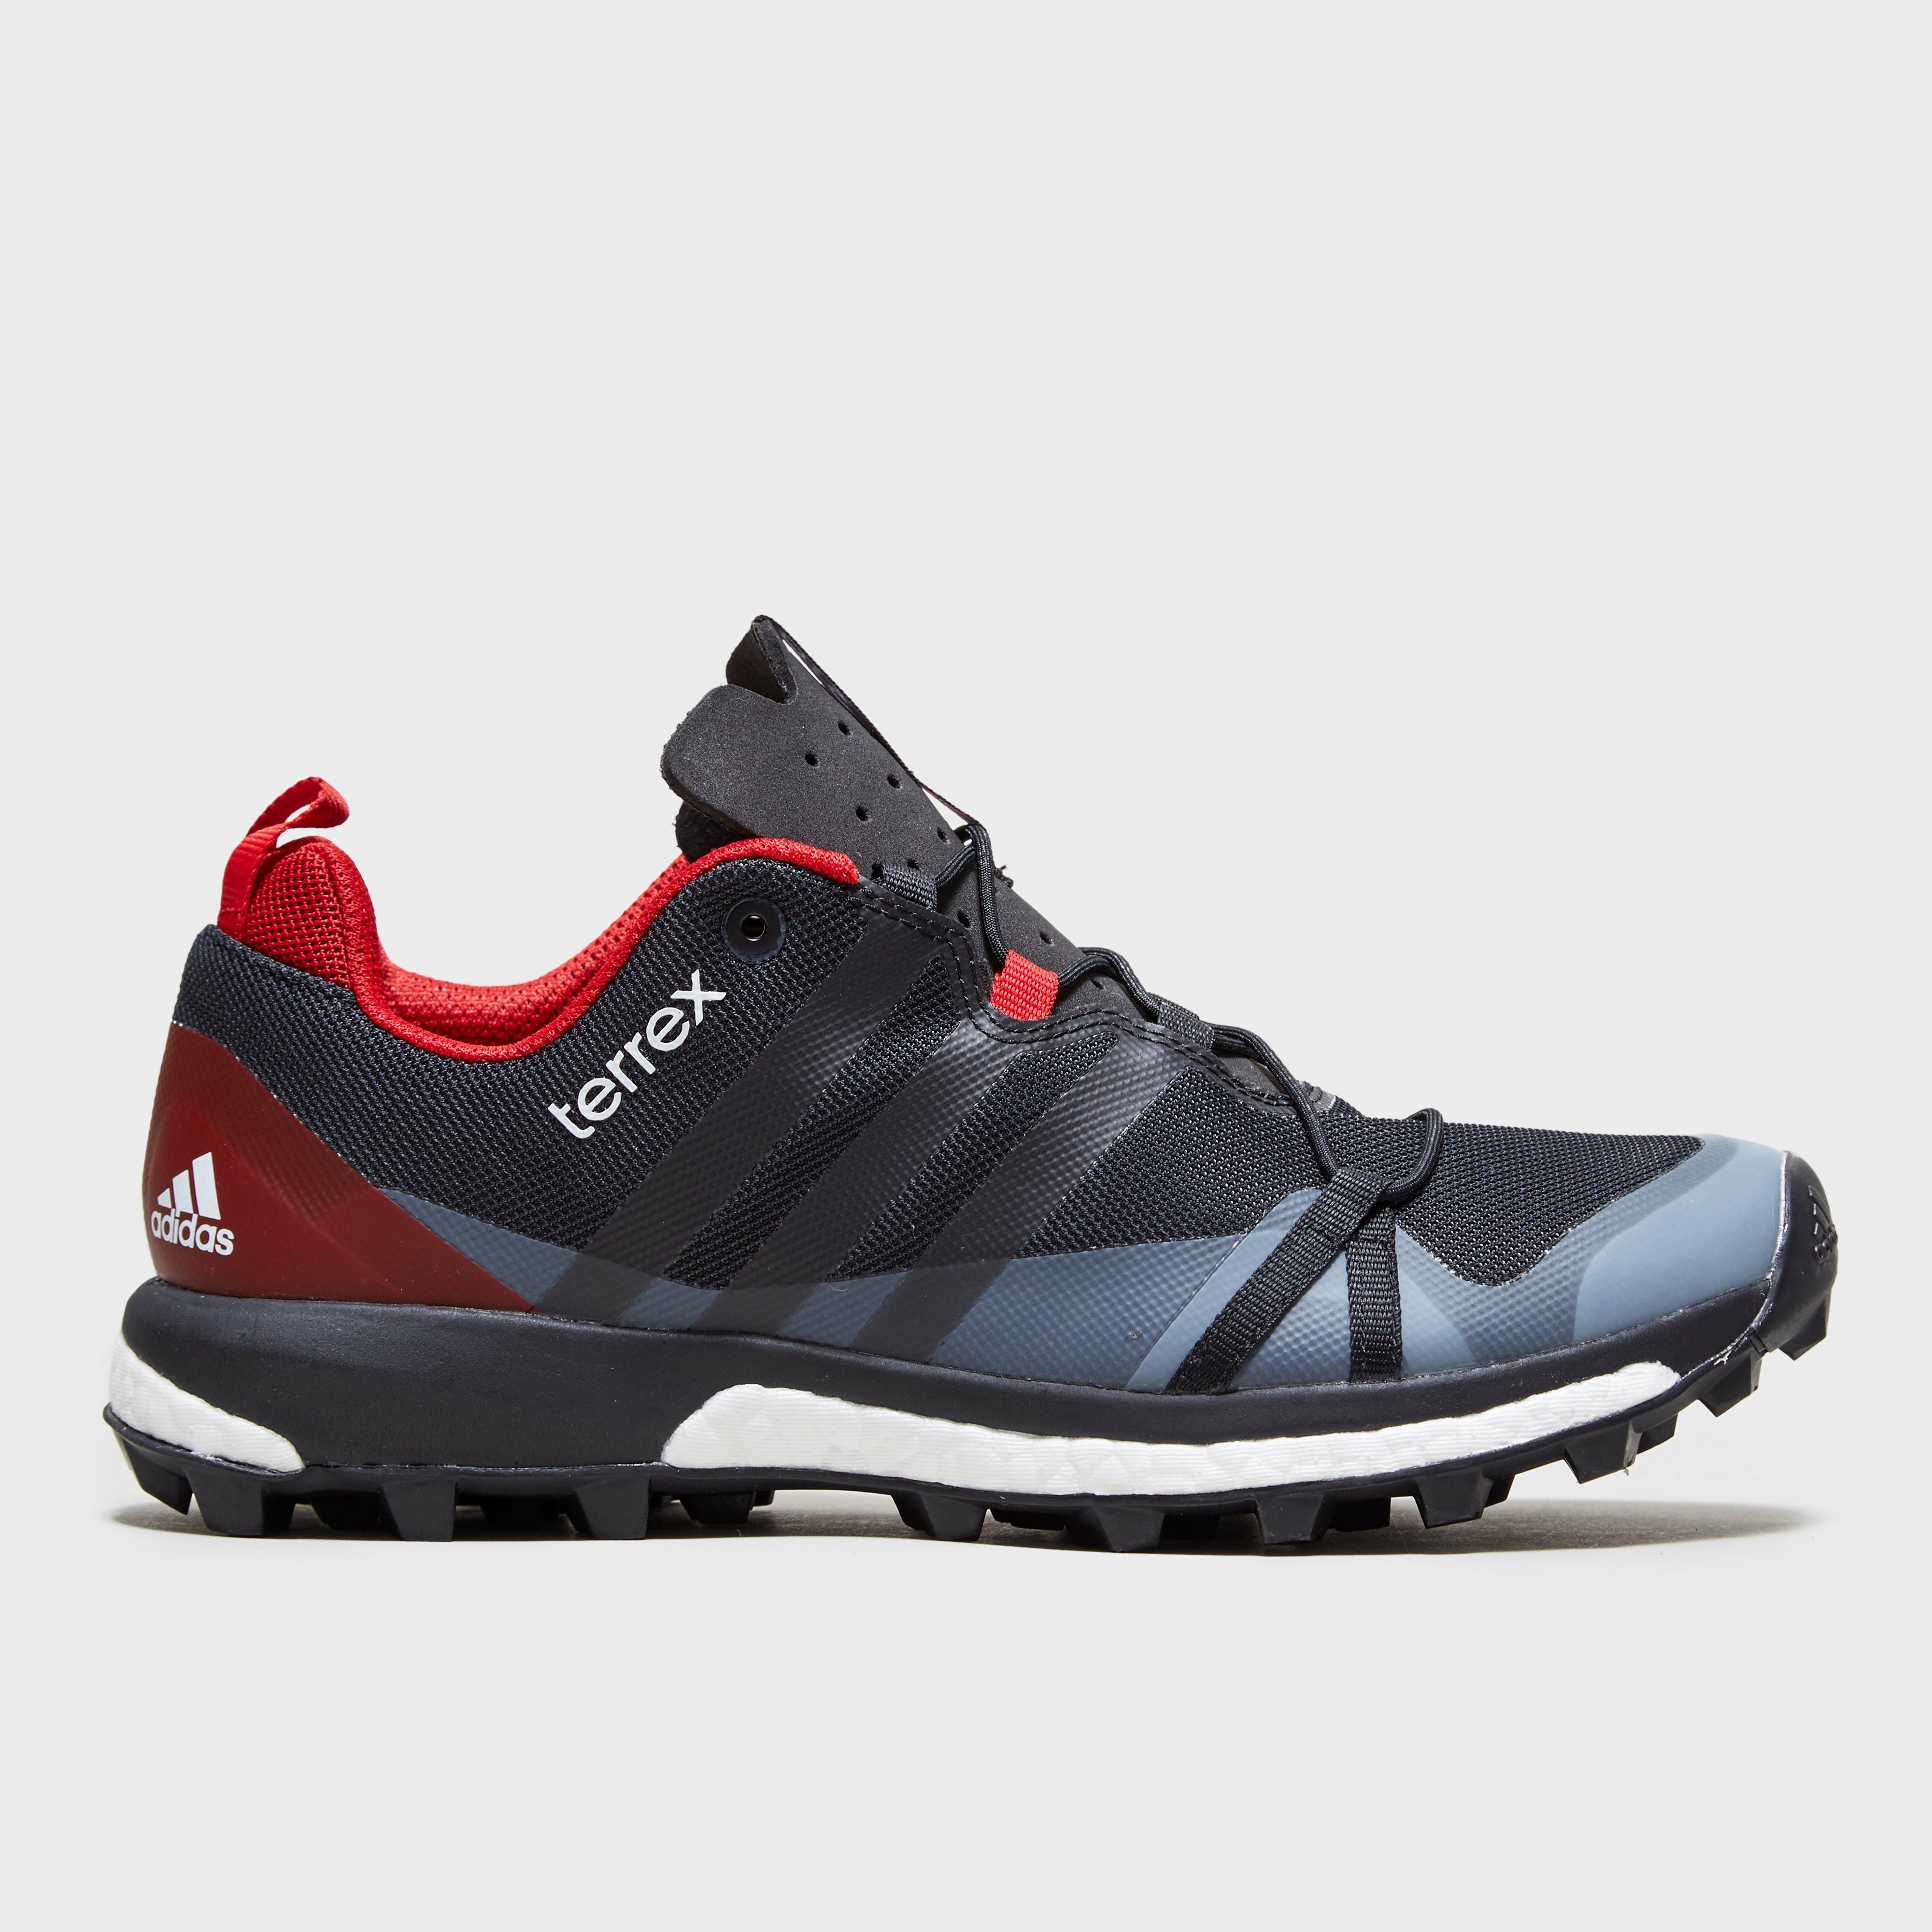 Adidas Mens Terrex Agravic Boost Shoe RedBlack